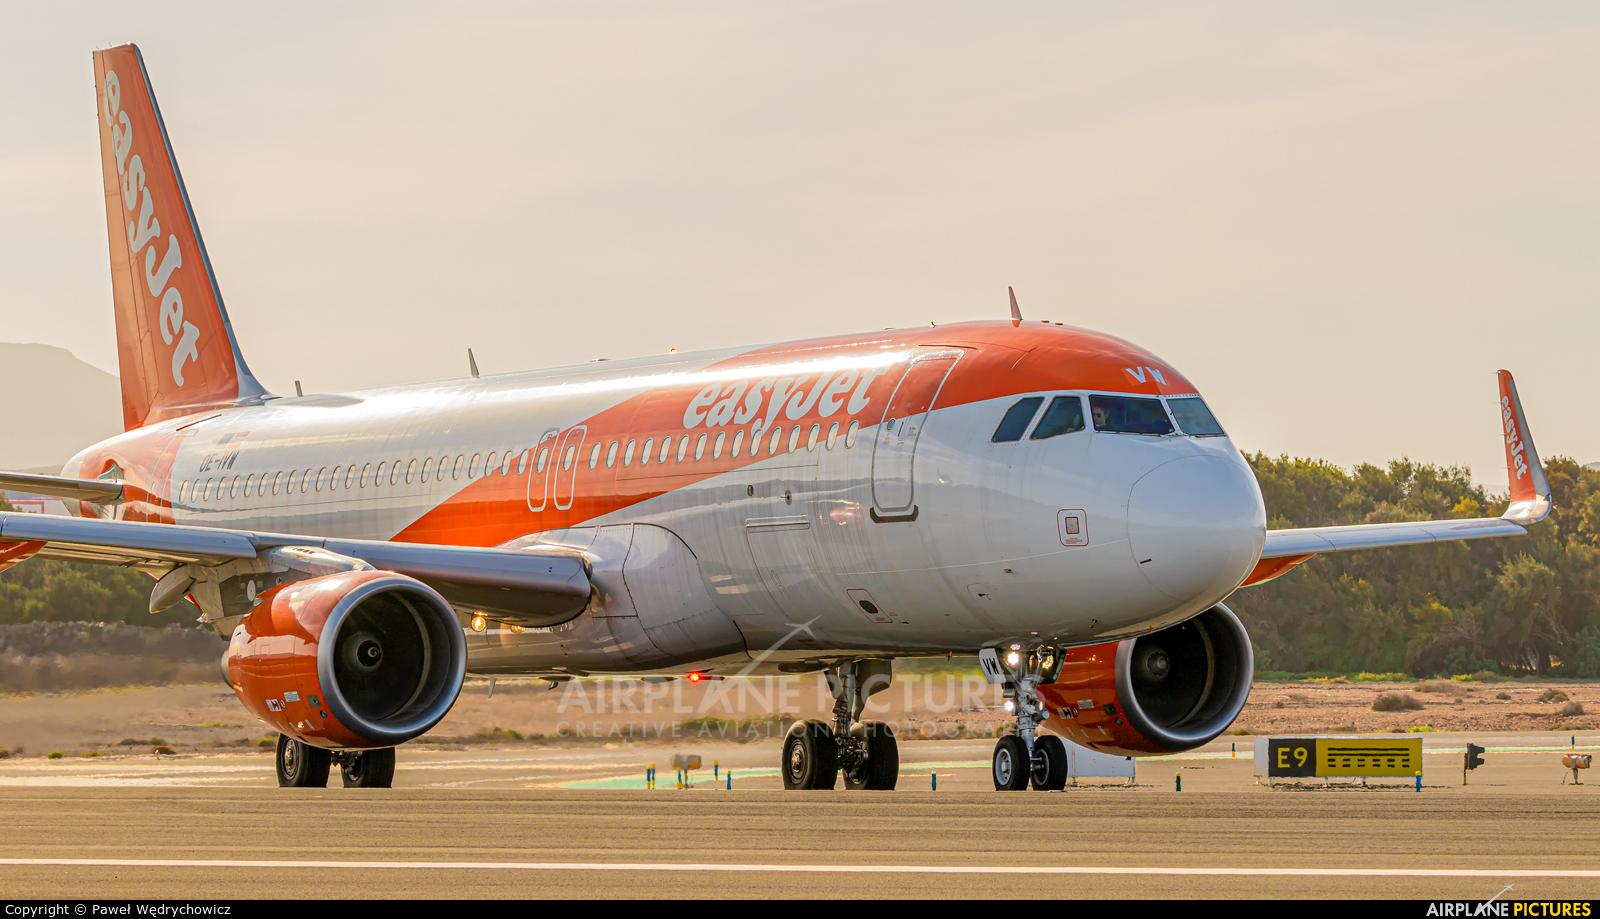 easyJet Europe OE-IVW aircraft at Fuerteventura - Puerto del Rosario